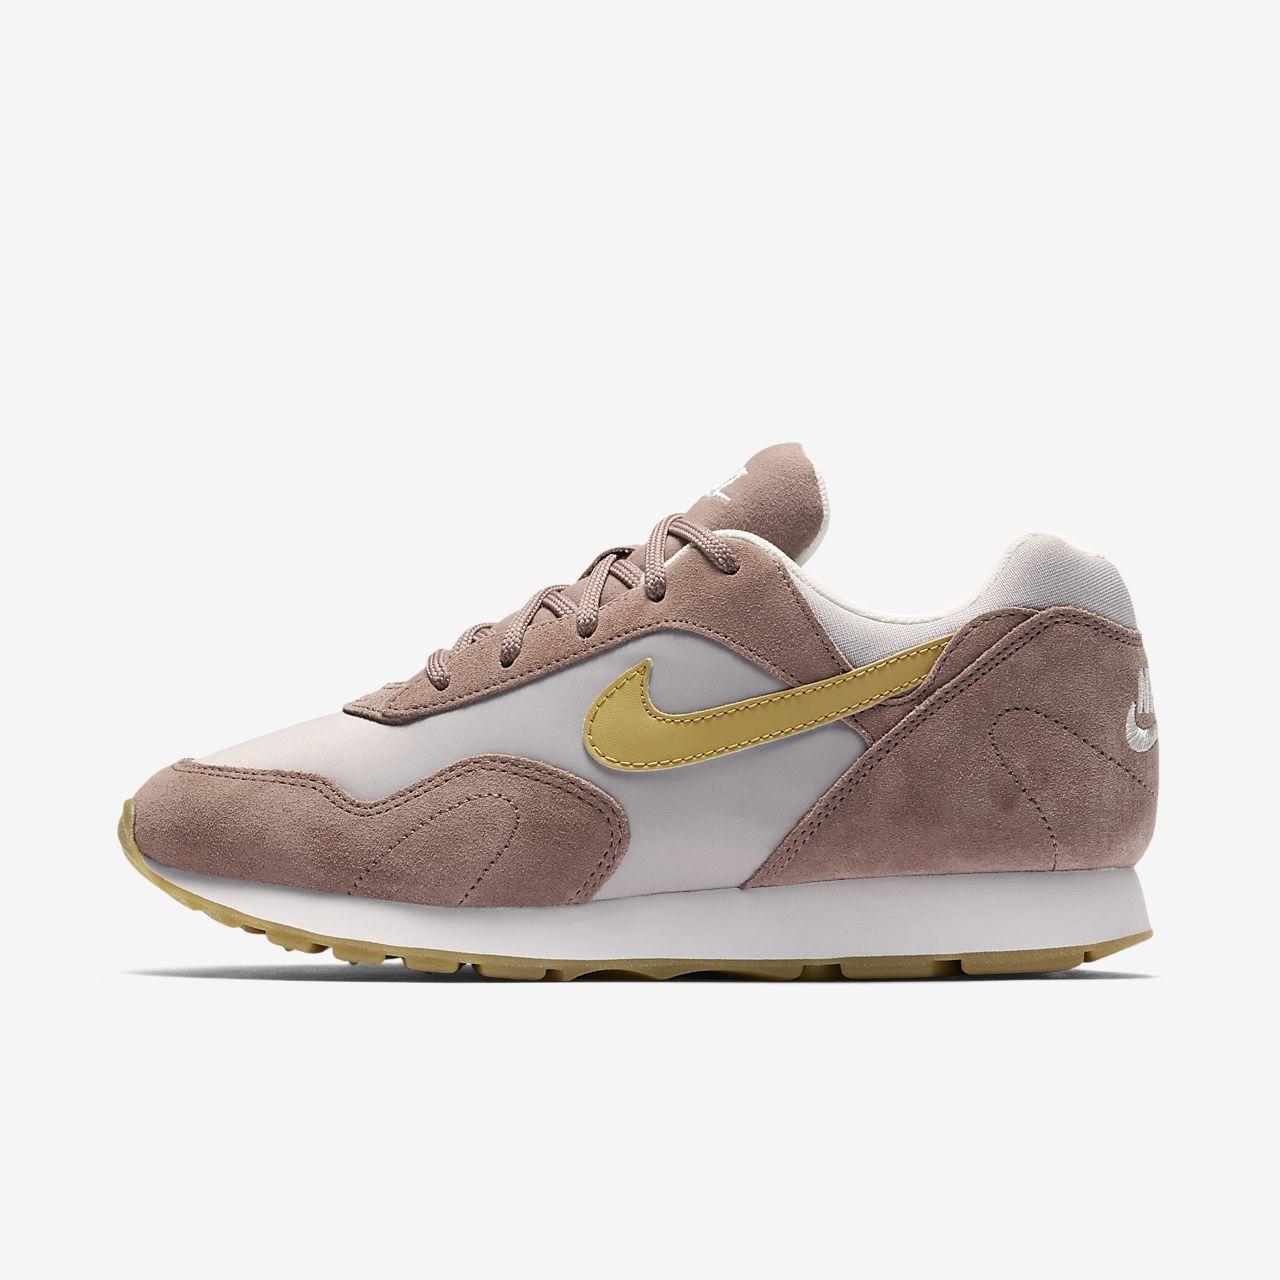 c2e4342fd53 Nike Outburst Women's Shoe. Nike.com GB